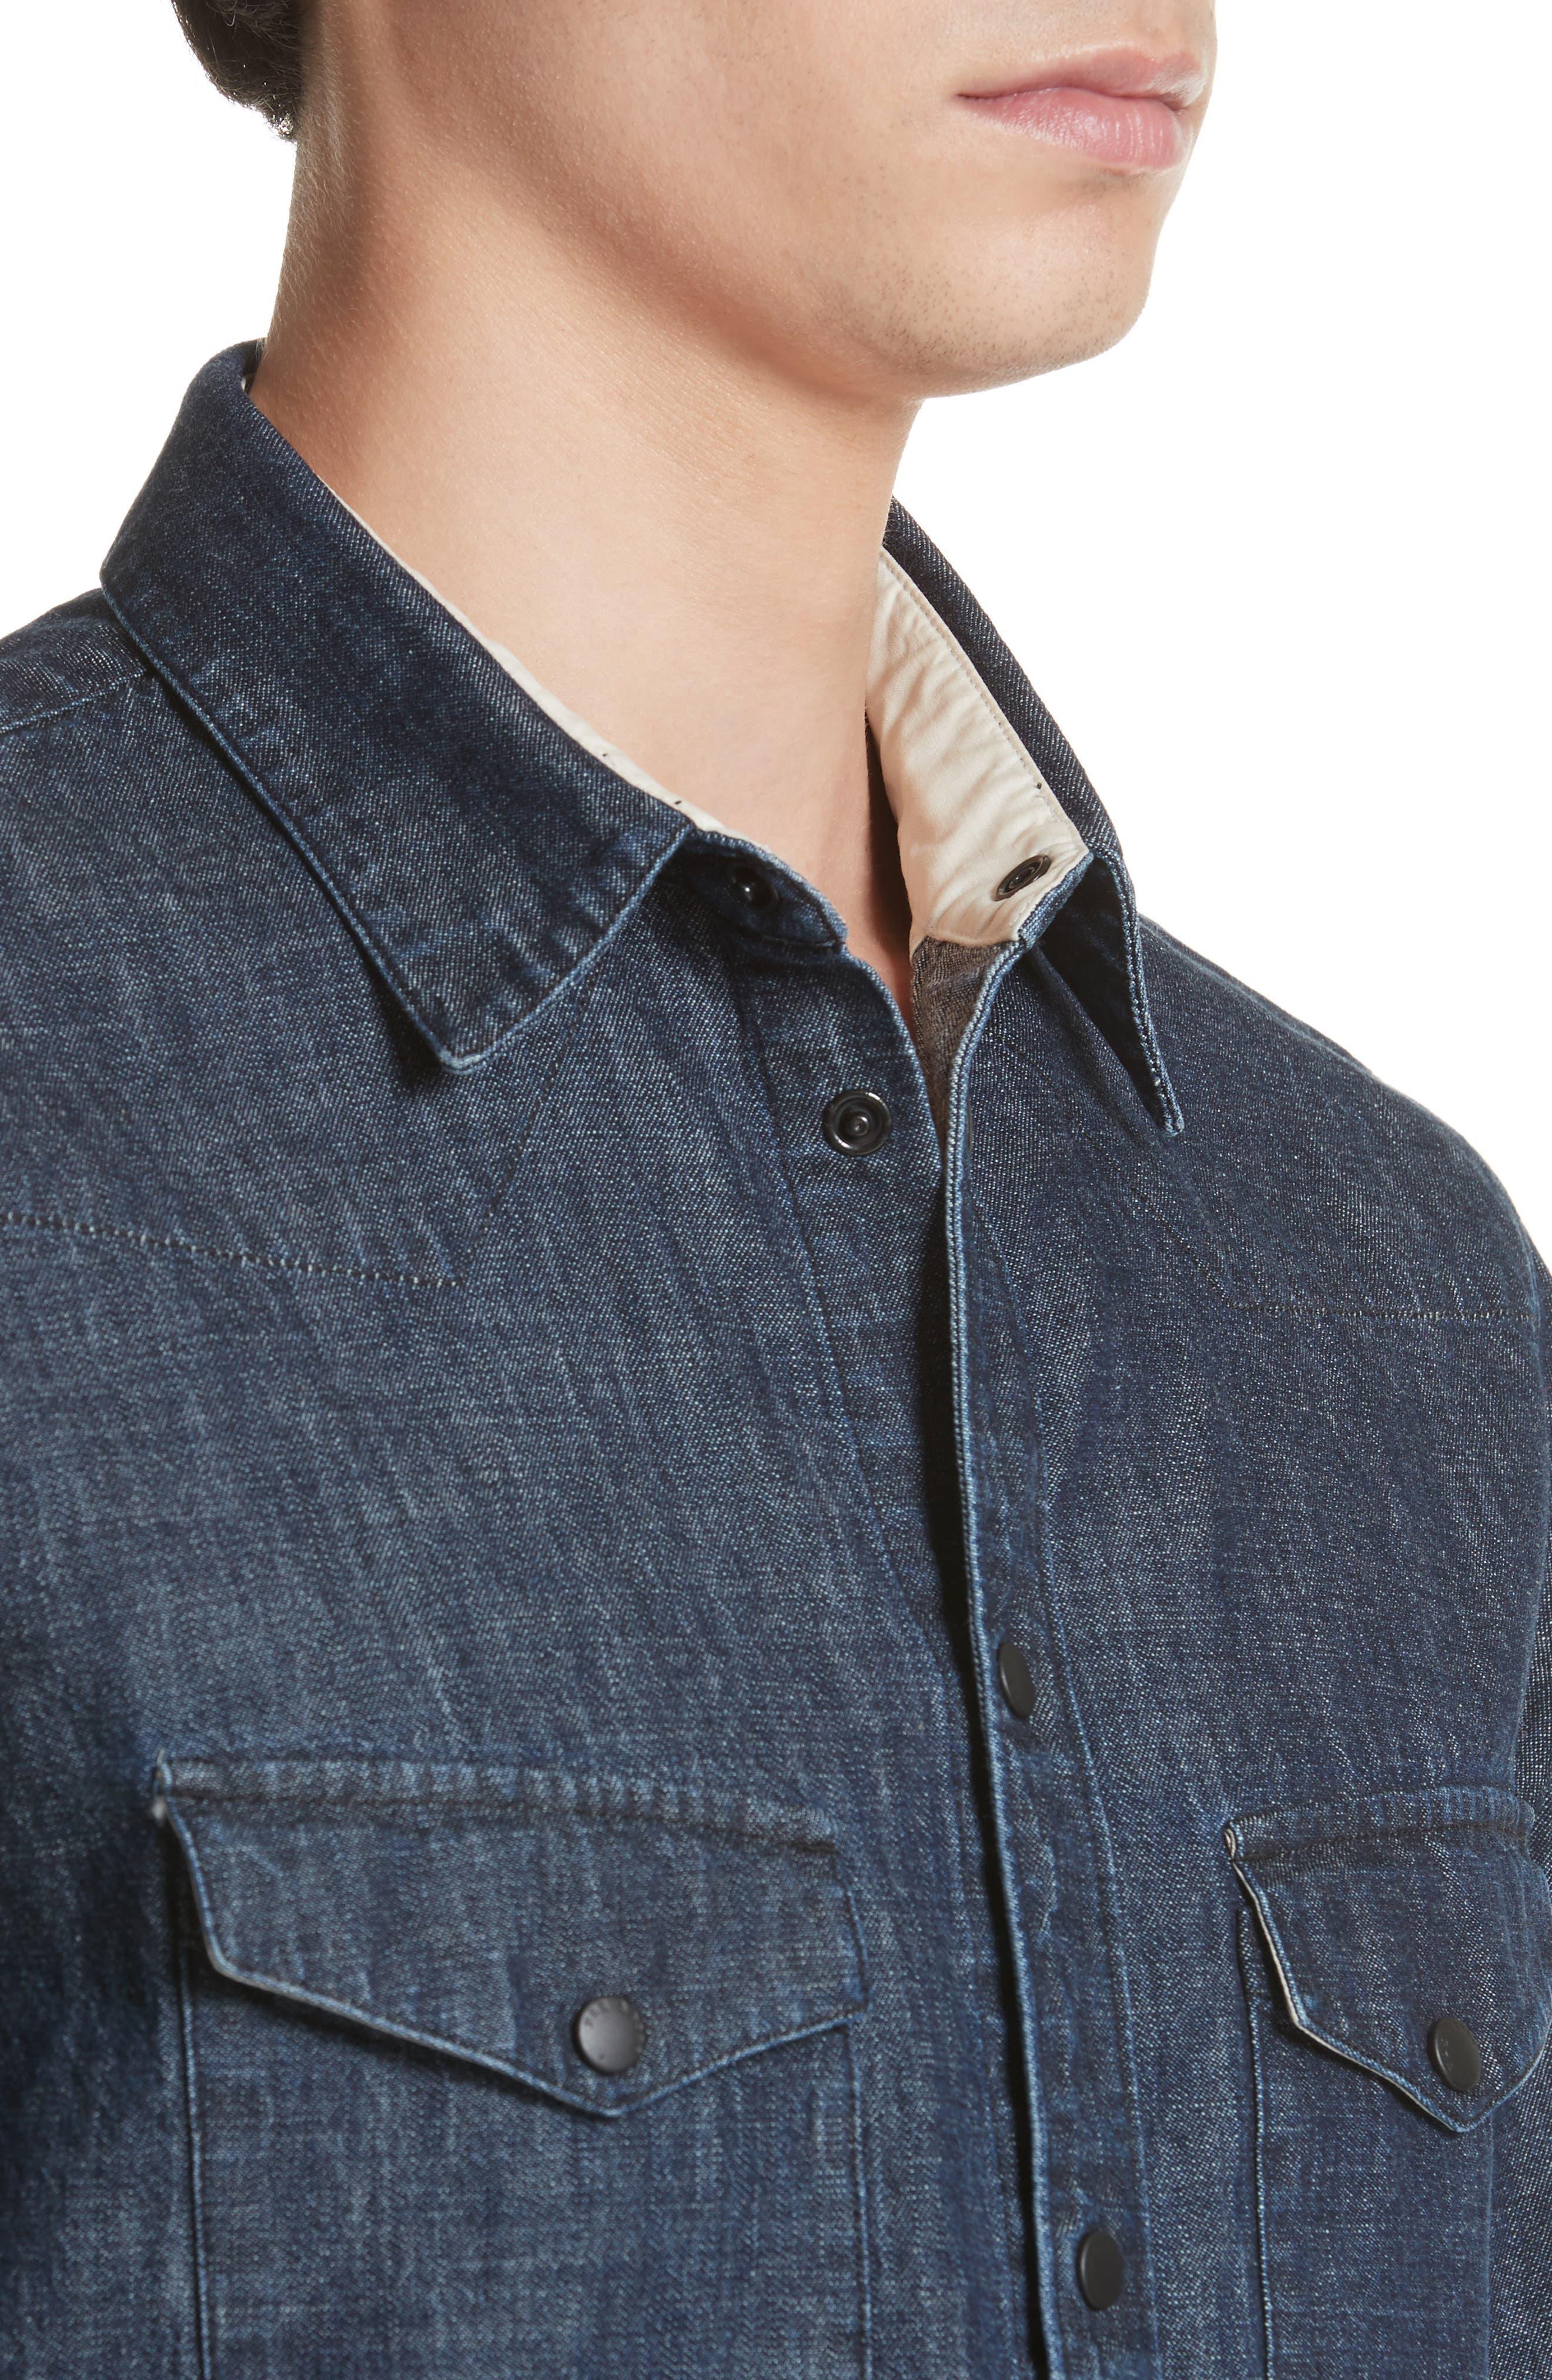 Beck Denim Shirt,                             Alternate thumbnail 5, color,                             470